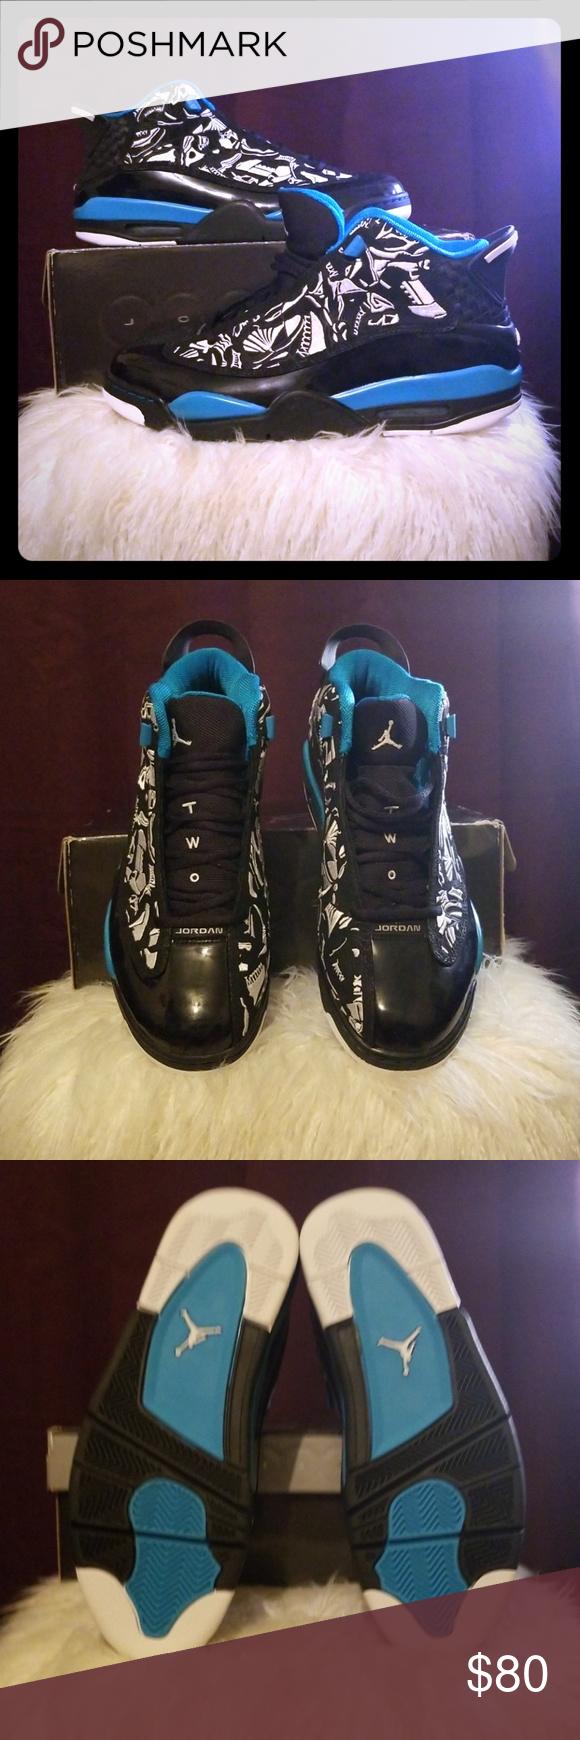 578957bb6fc2 AIR JORDAN DUB ZERO AIR JORDAN Black White-Laser Blue Launch Date  5 23 09  Jordan Shoes Athletic Shoes